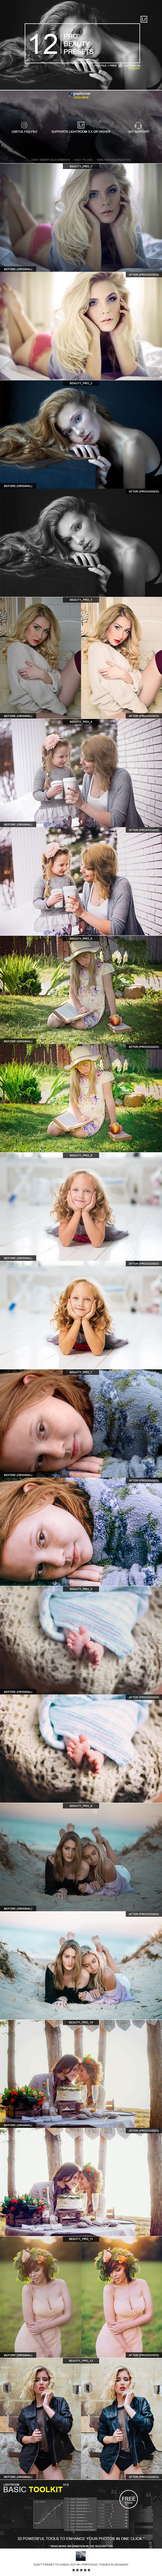 12 Pro Beauty Presets - Lightroom Presets Add-ons